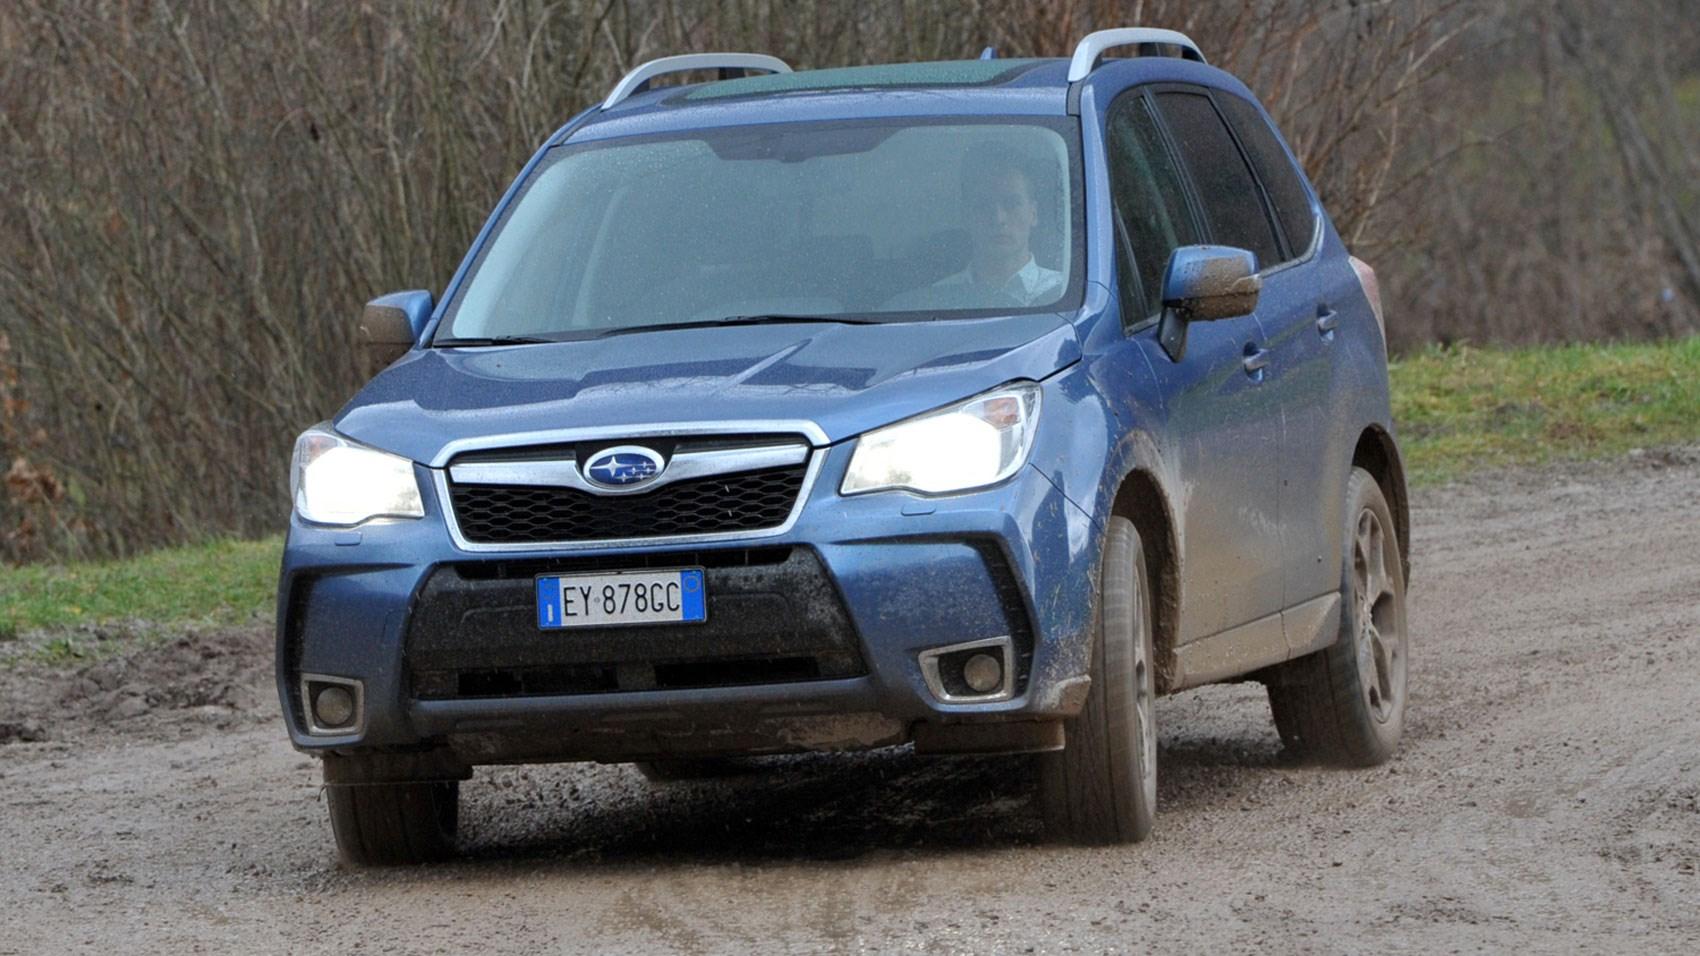 Subaru Lease Deals >> Subaru Forester 2.0D Lineartronic XC Premium (2015) review ...